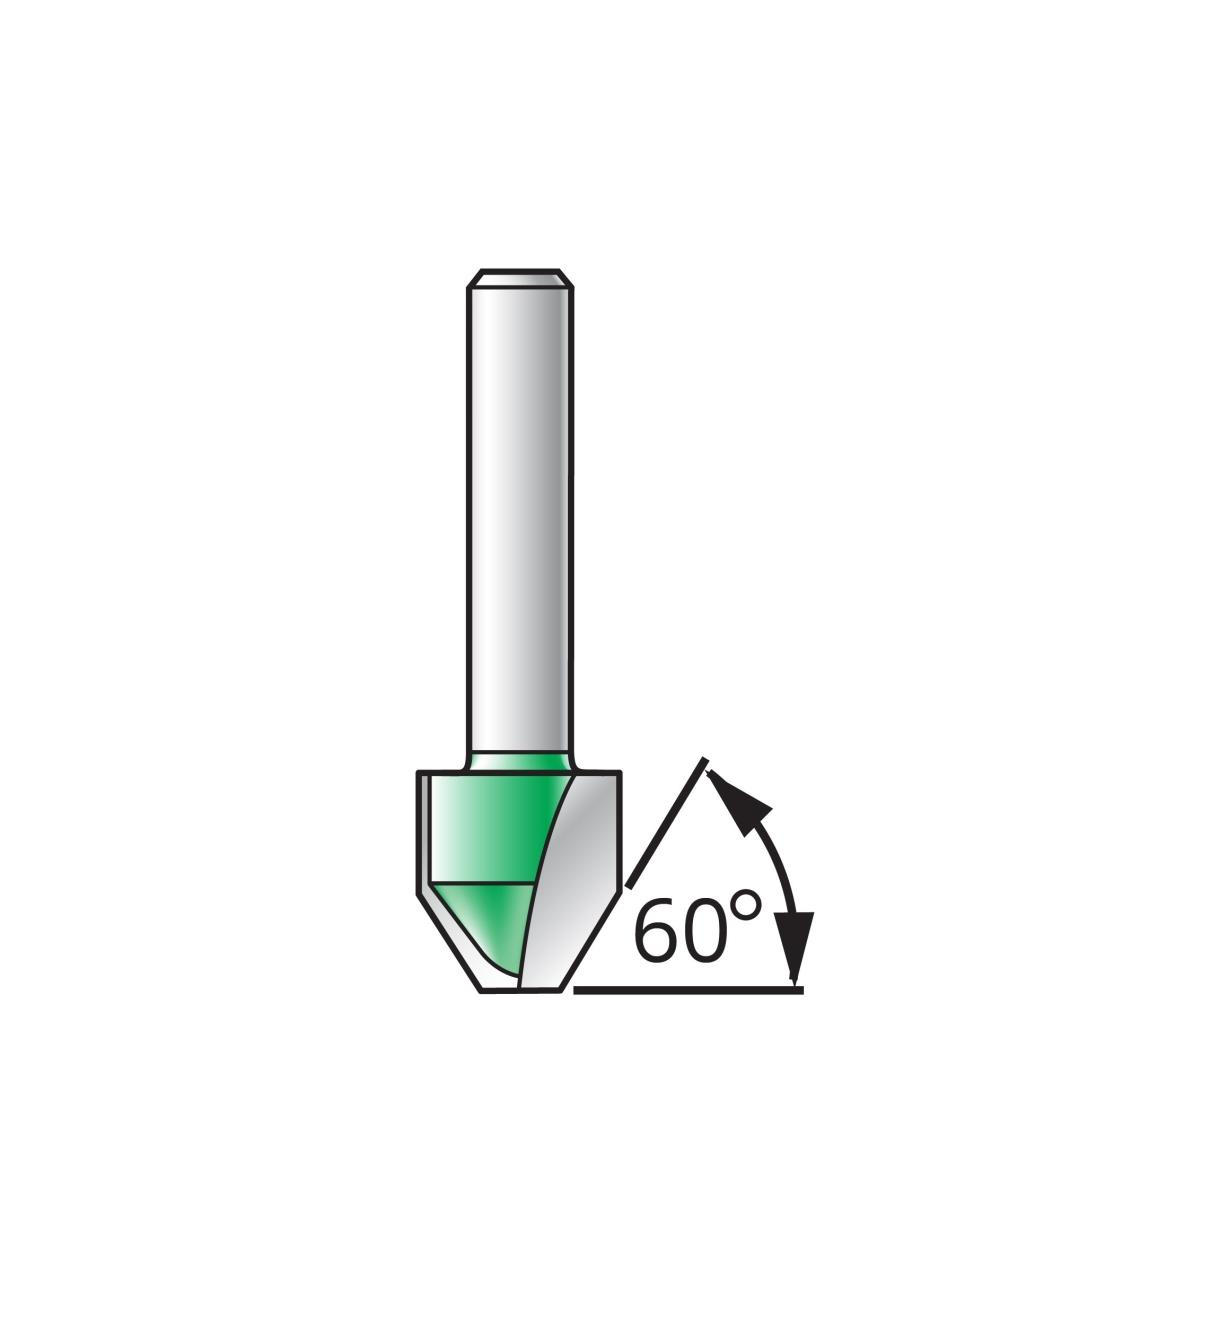 16J5303 - Flat Lettering Bit